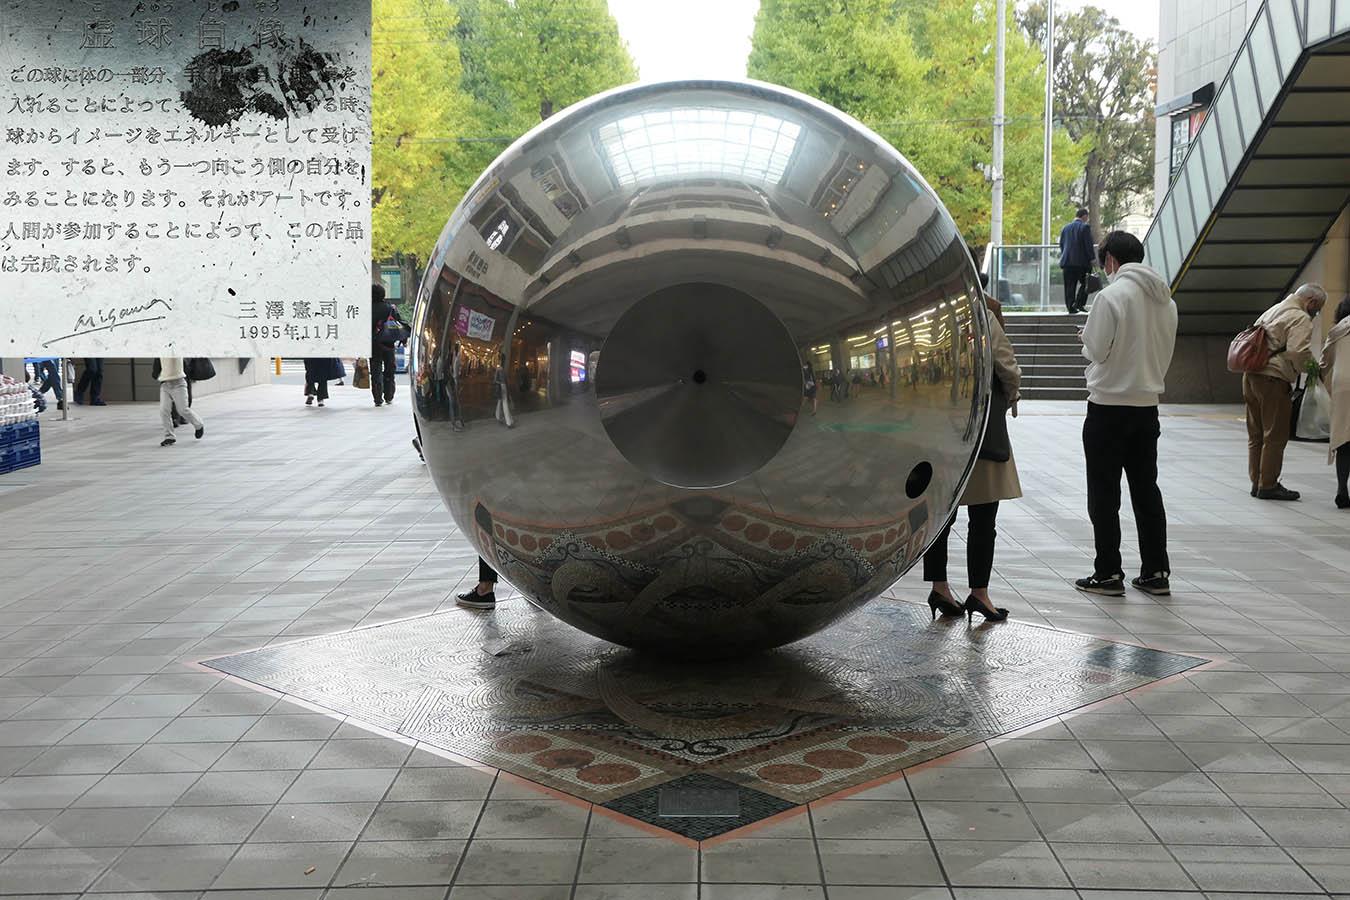 MG13_photo08.jpg